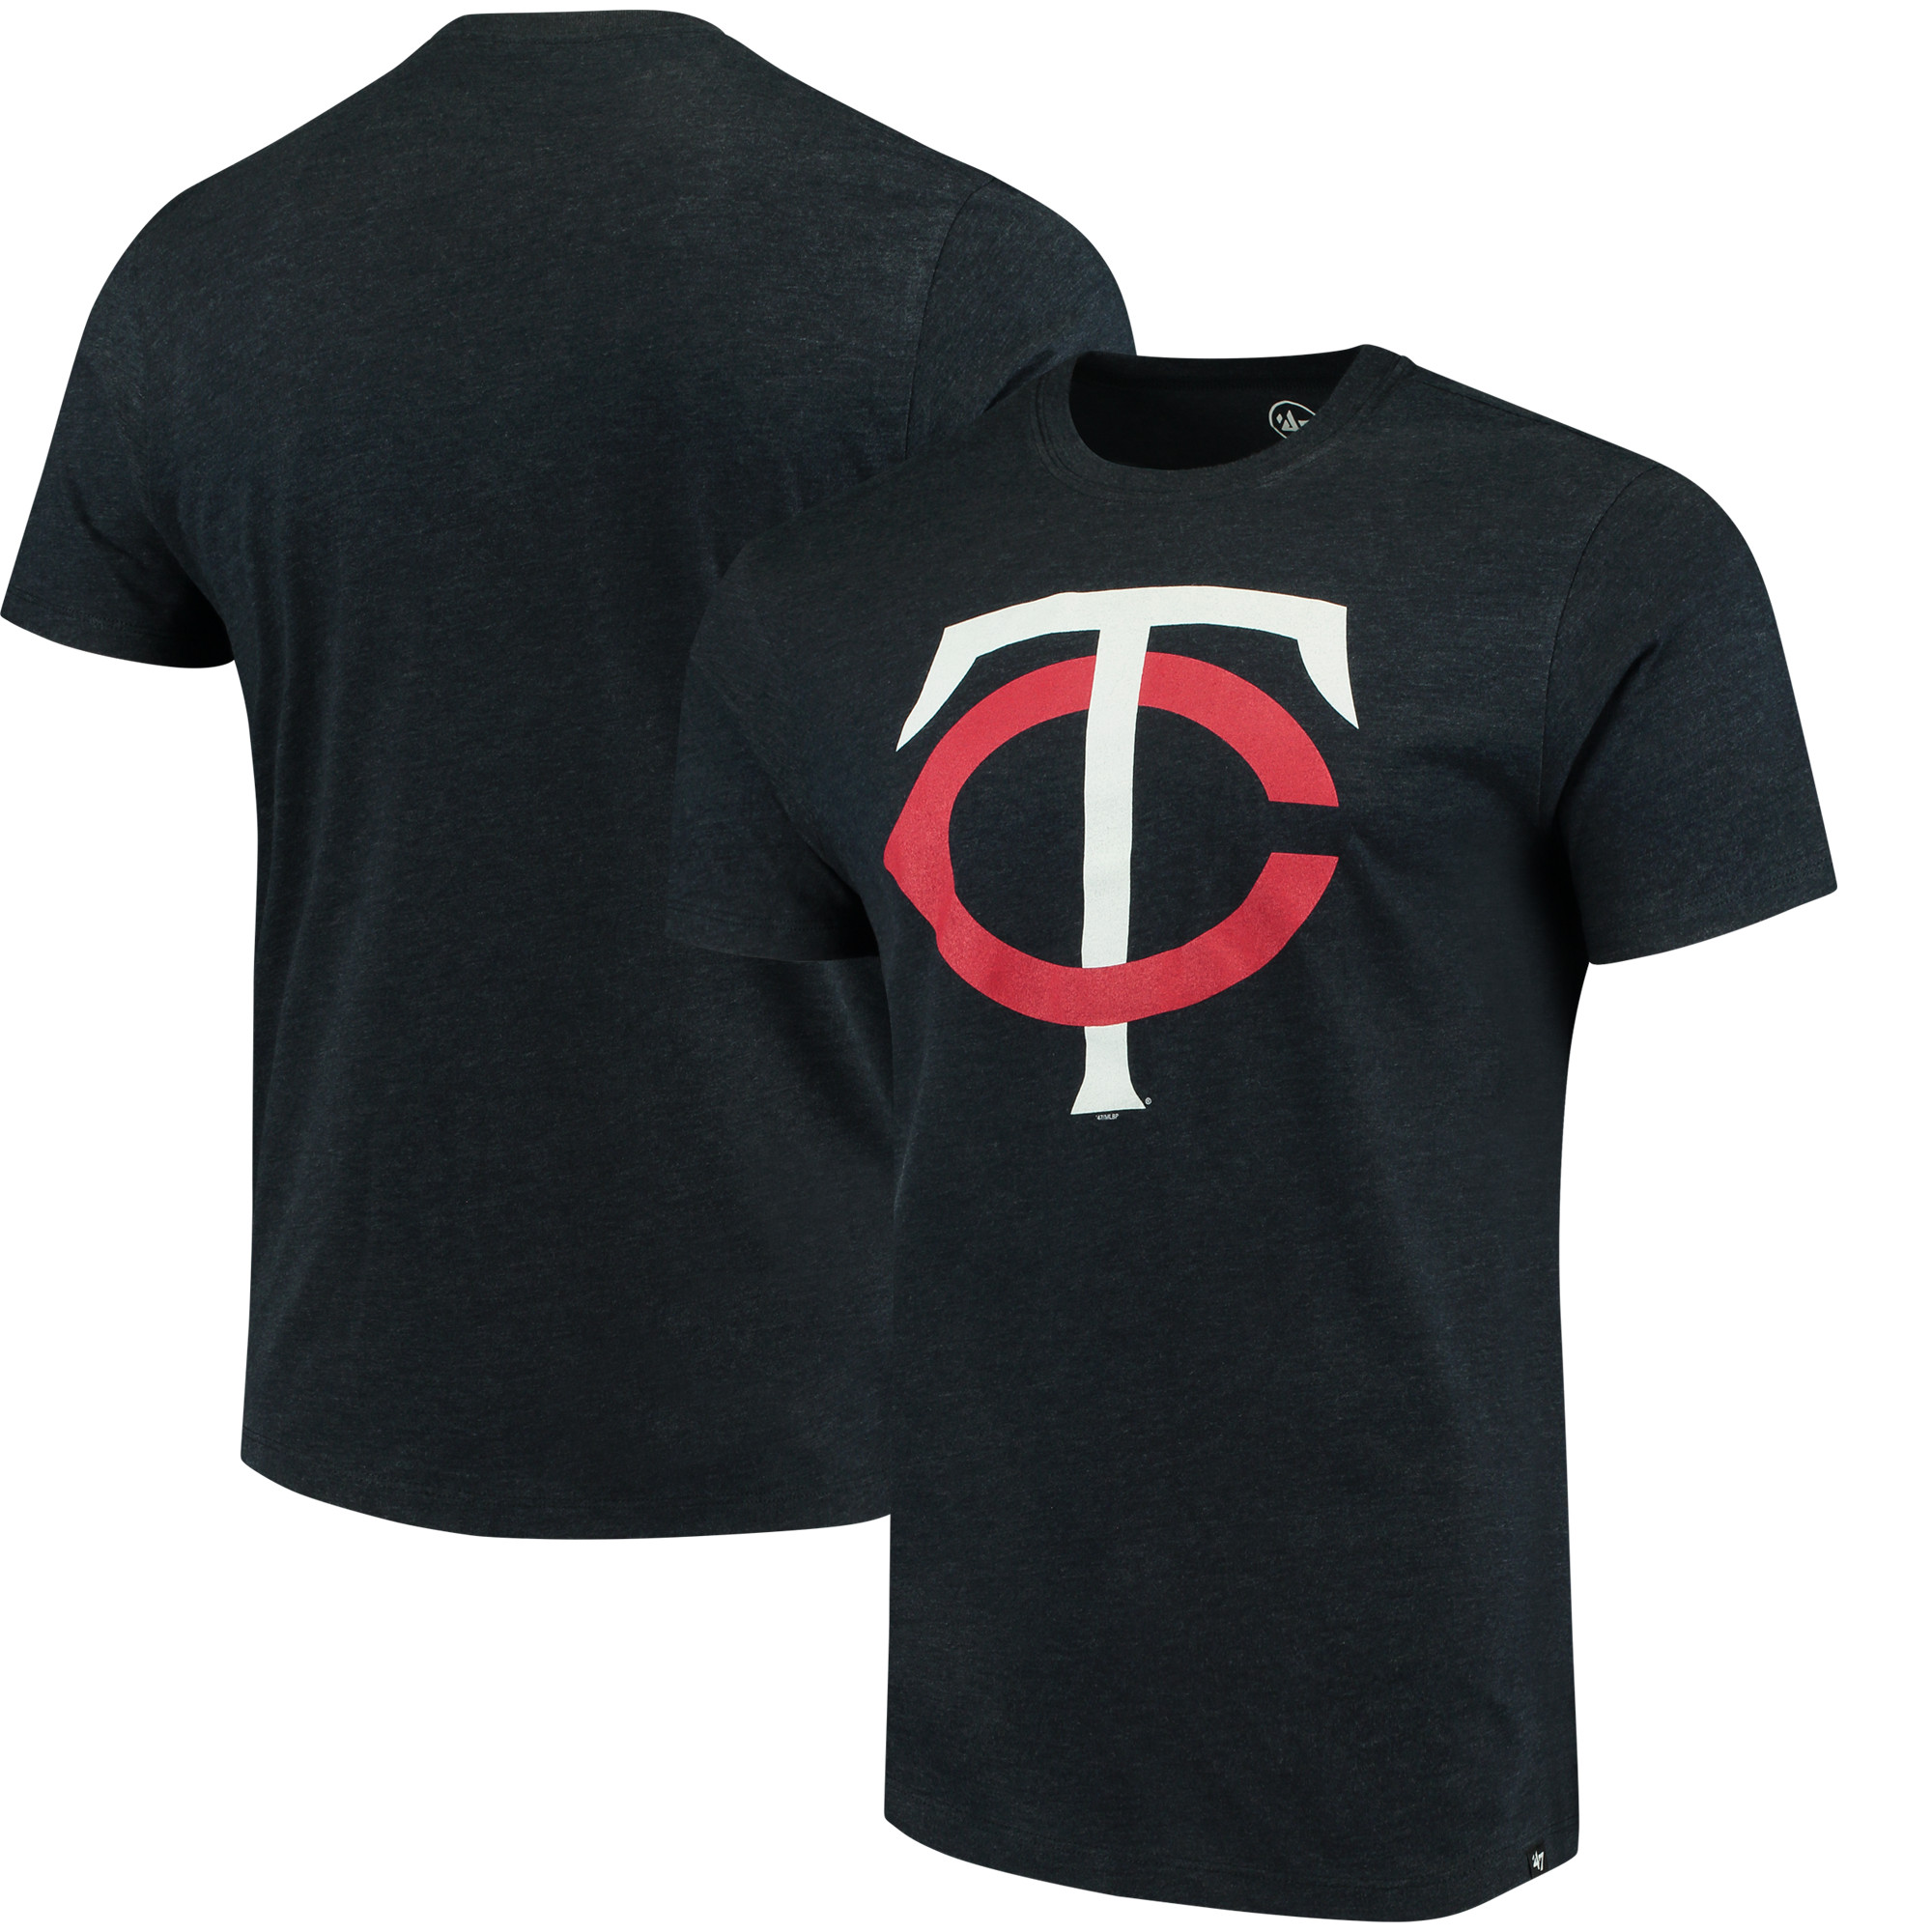 Minnesota Twins '47 Club T-Shirt - Navy